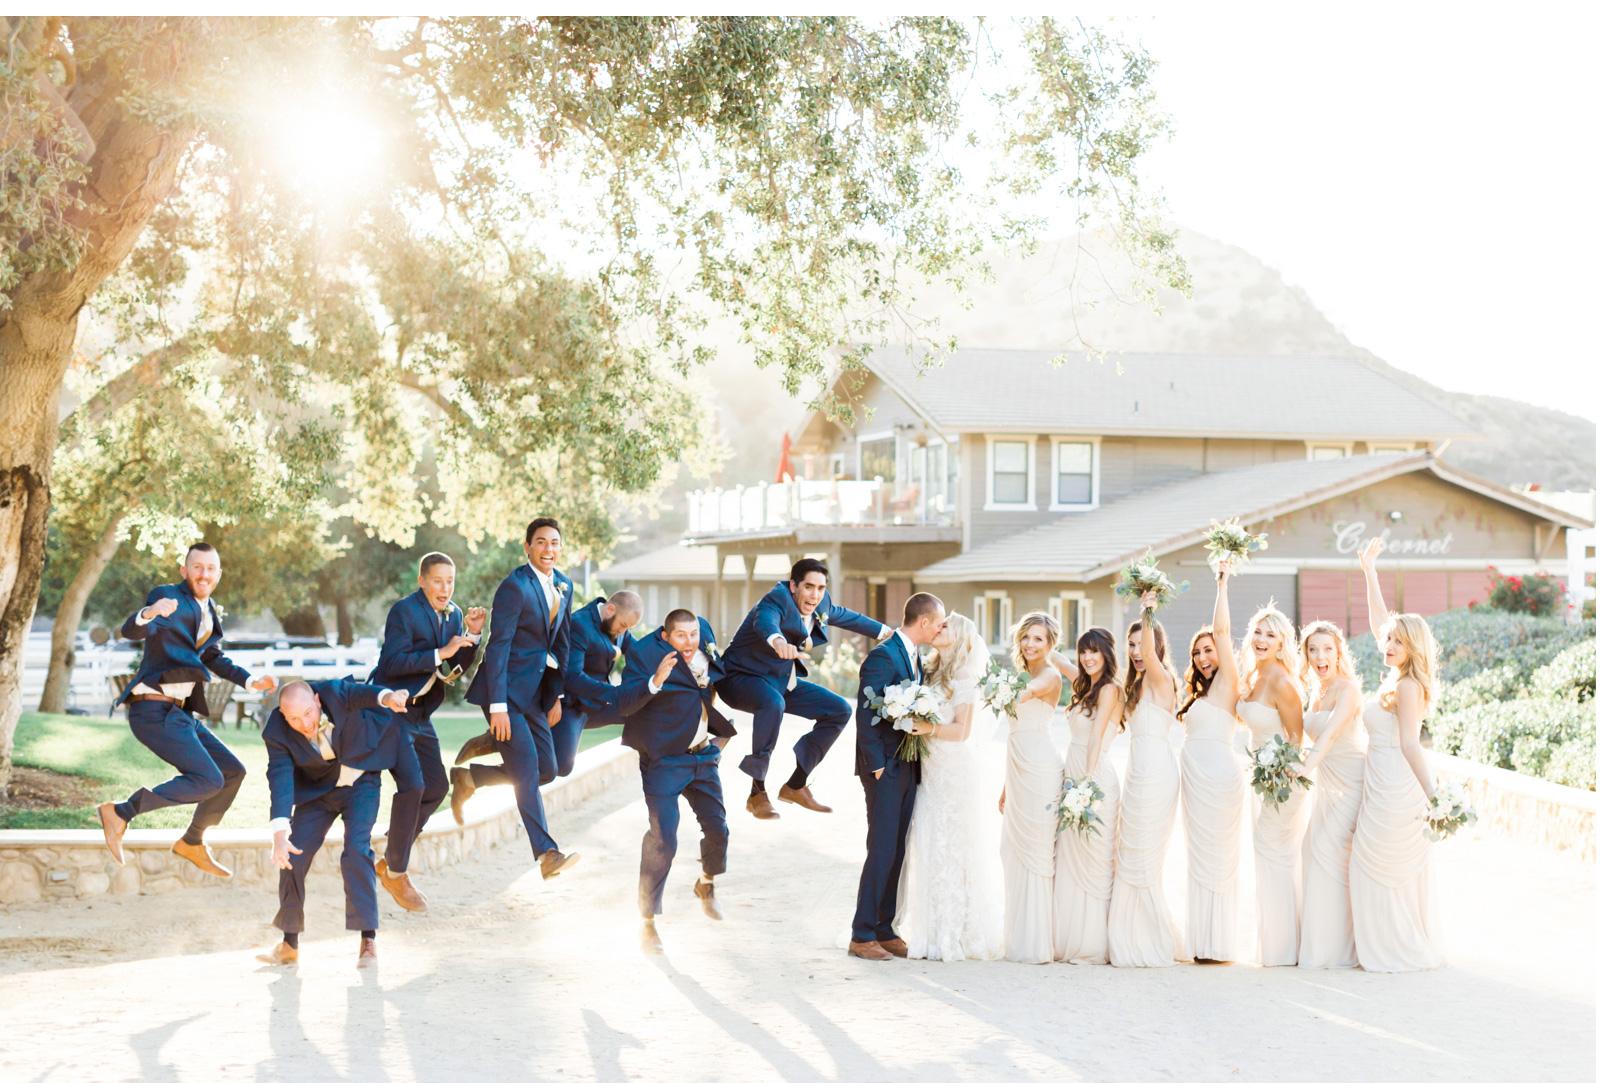 Style-Me-Pretty-Wedding-Photographer-Natalie-Schutt-Photography-Calfornia-San-Luis-Obispo_11.jpg